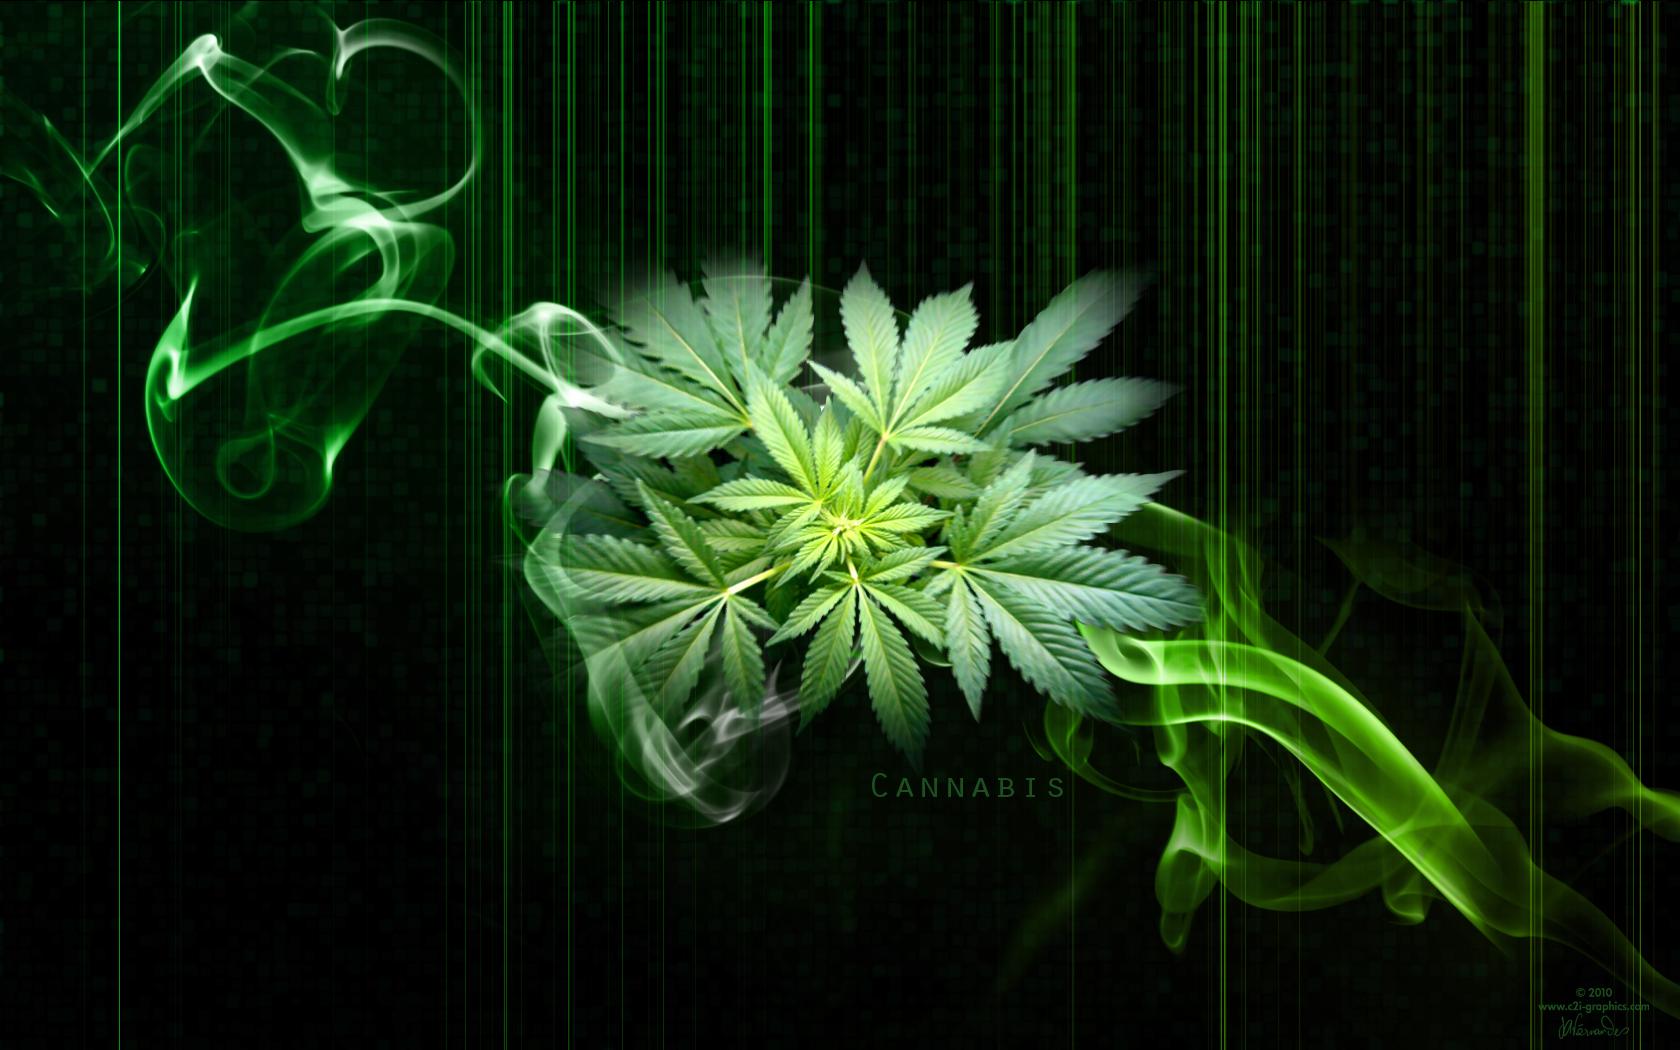 Cannabis Shankar boom boom shankar 1680x1050